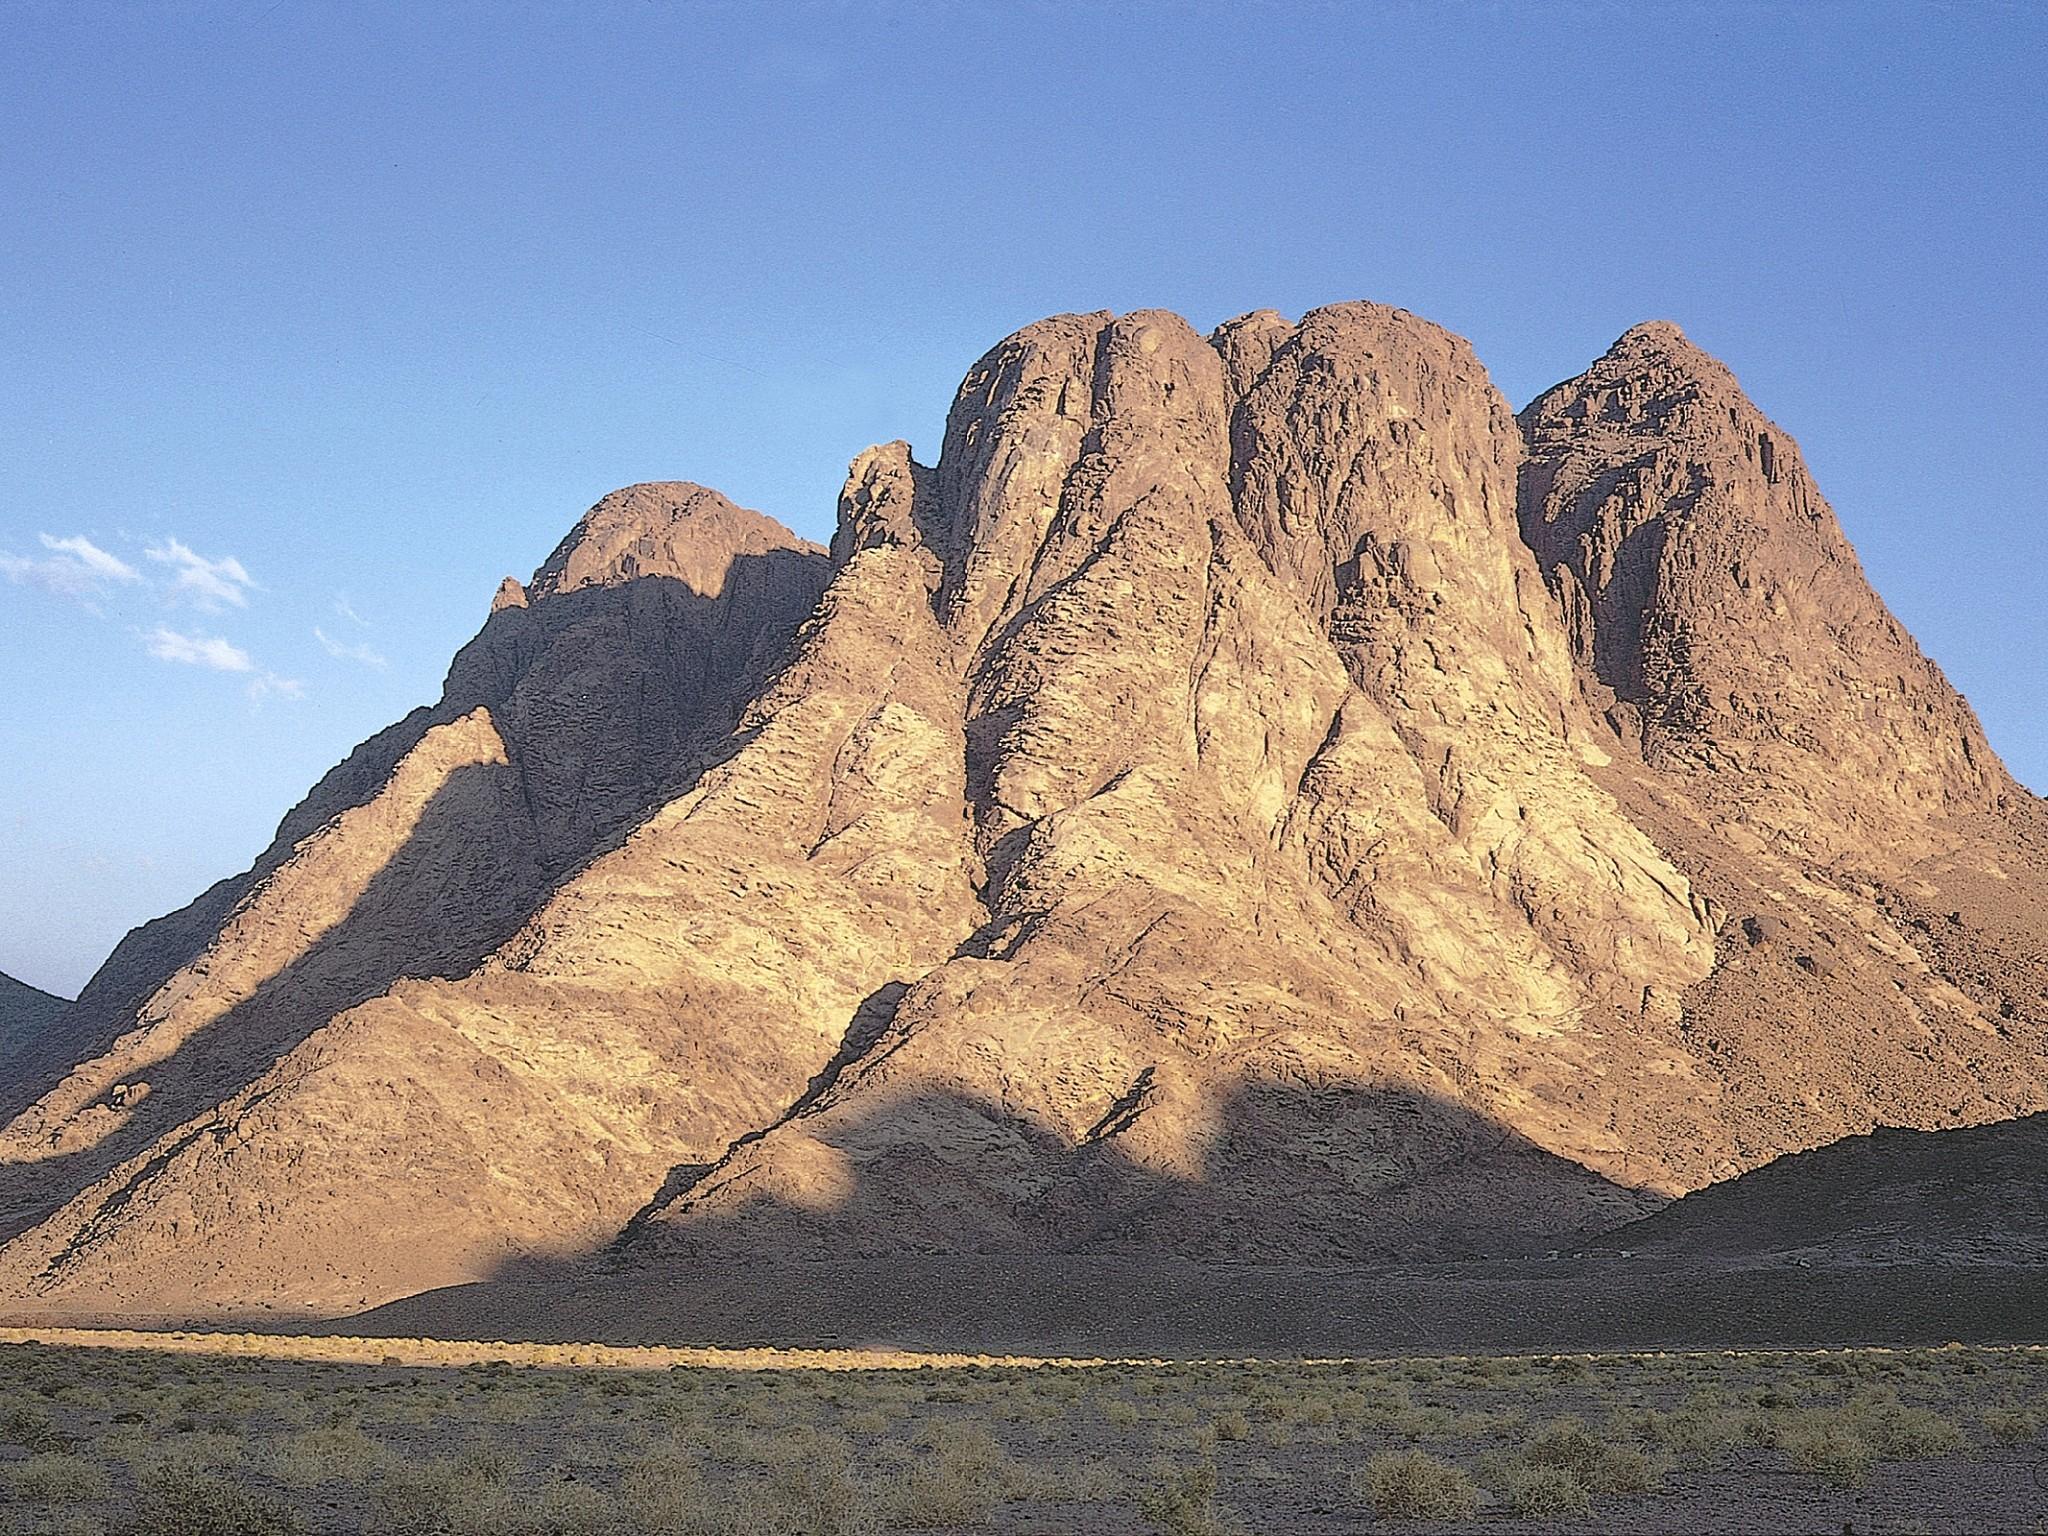 20 world class walks - Rough Guides | Rough Guides |Mount Sinai Eqypt